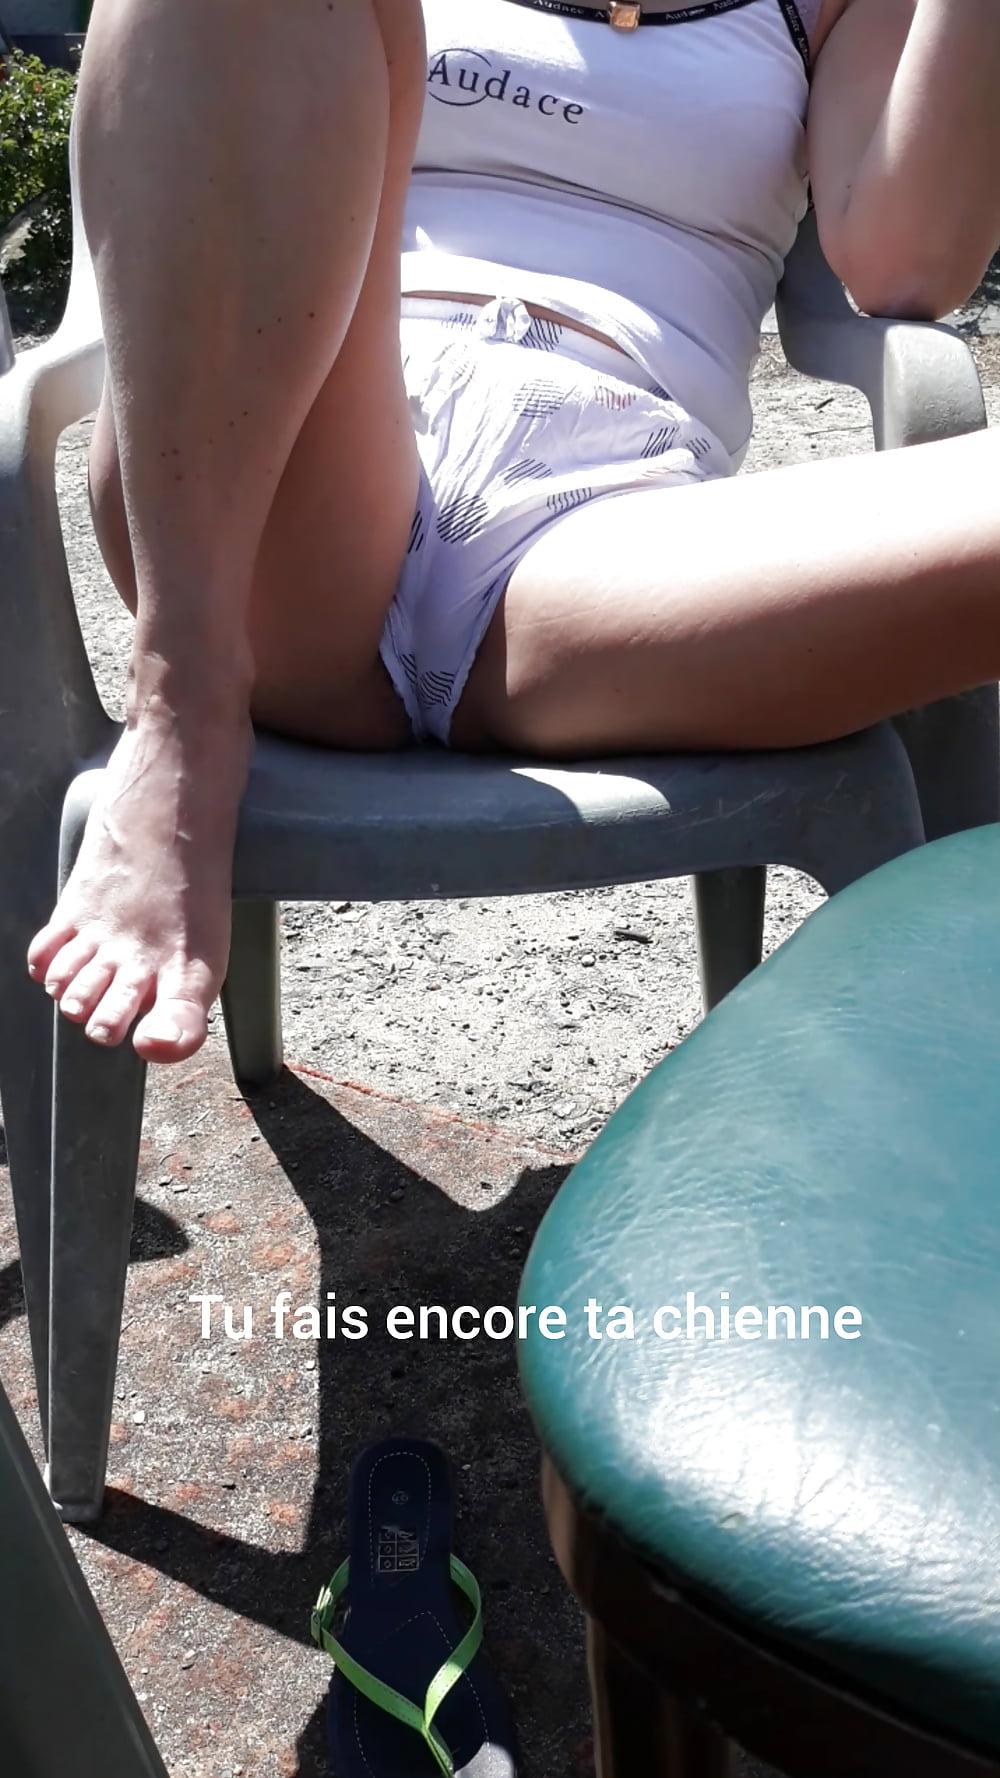 See And Save As Upshort No Pantie Chatte De Ma Femme Voyeur Porn